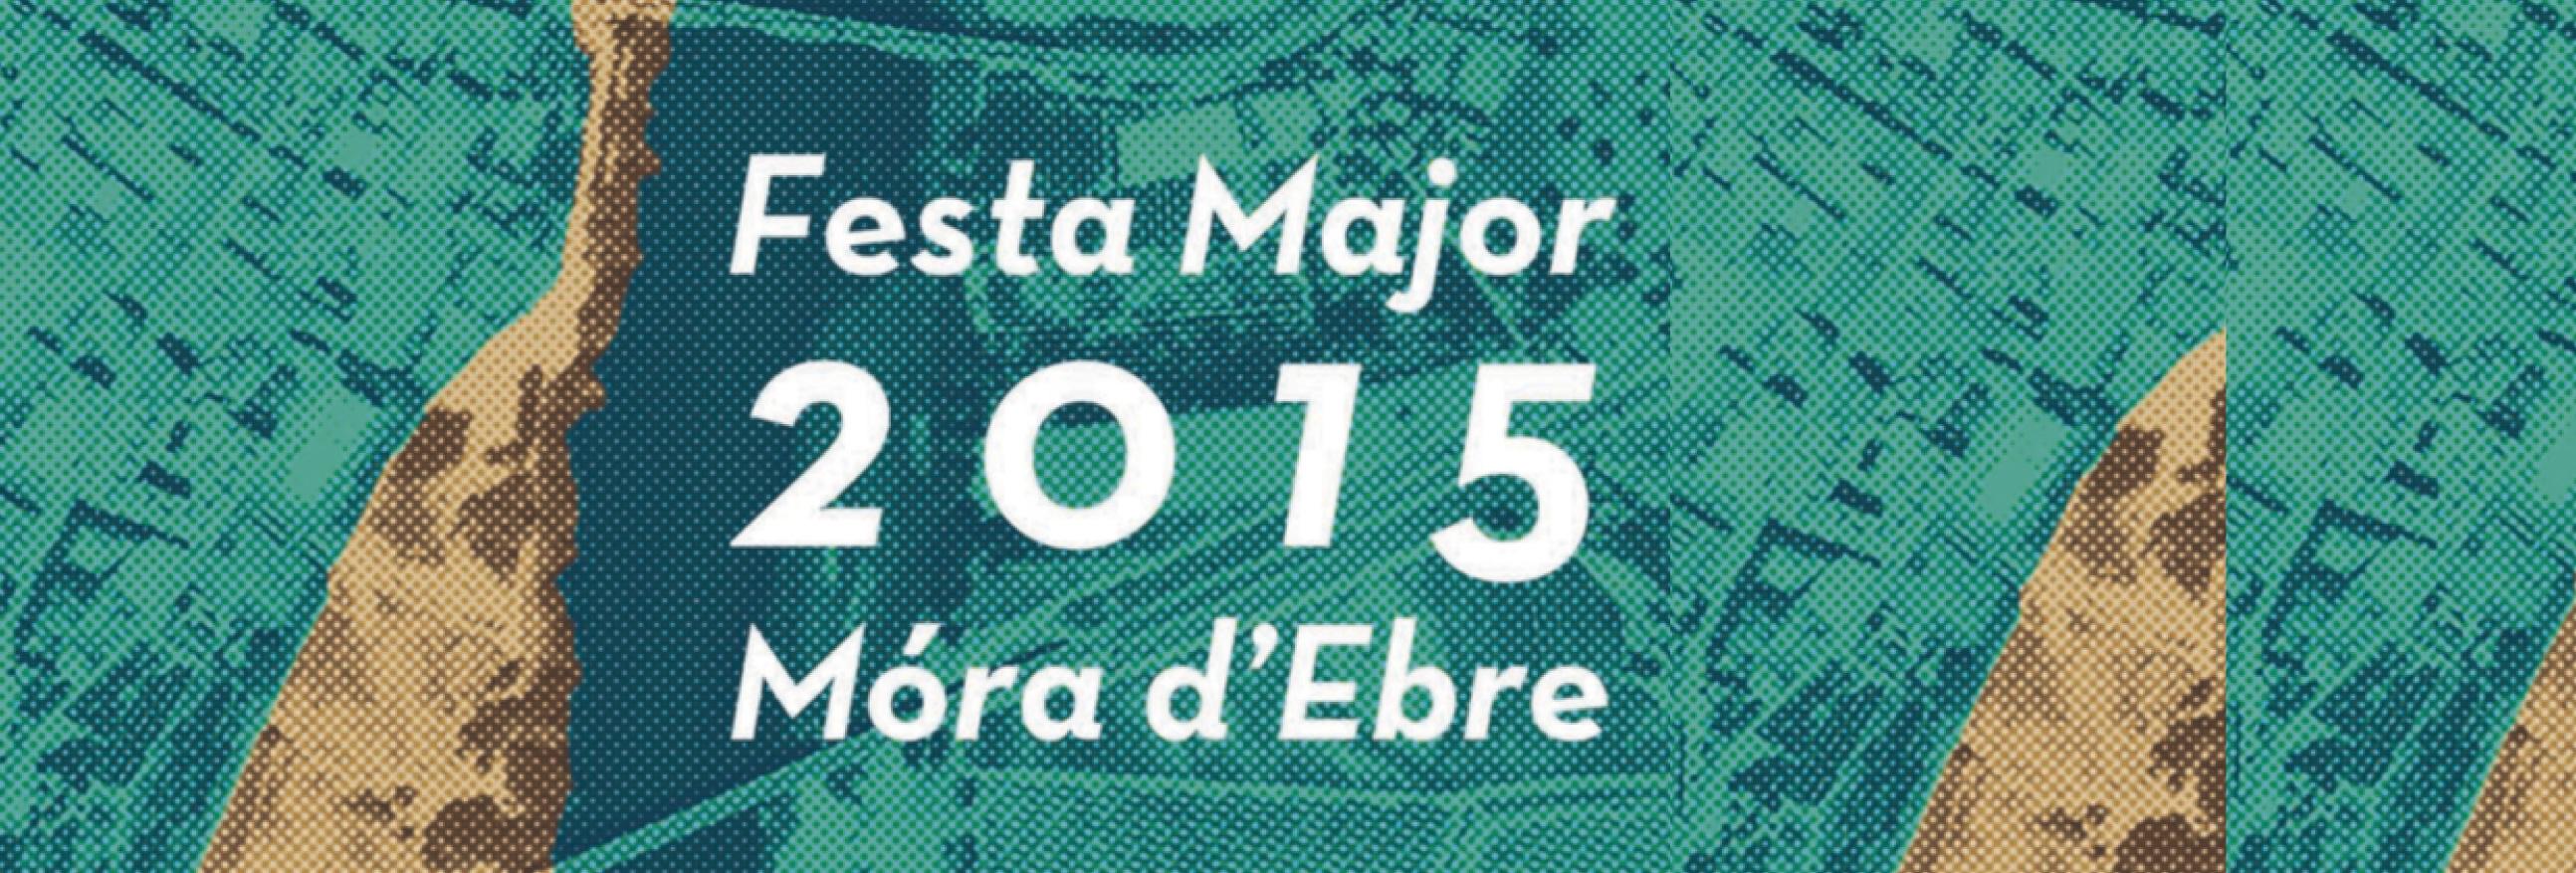 festa major de mora ebre 2015-01